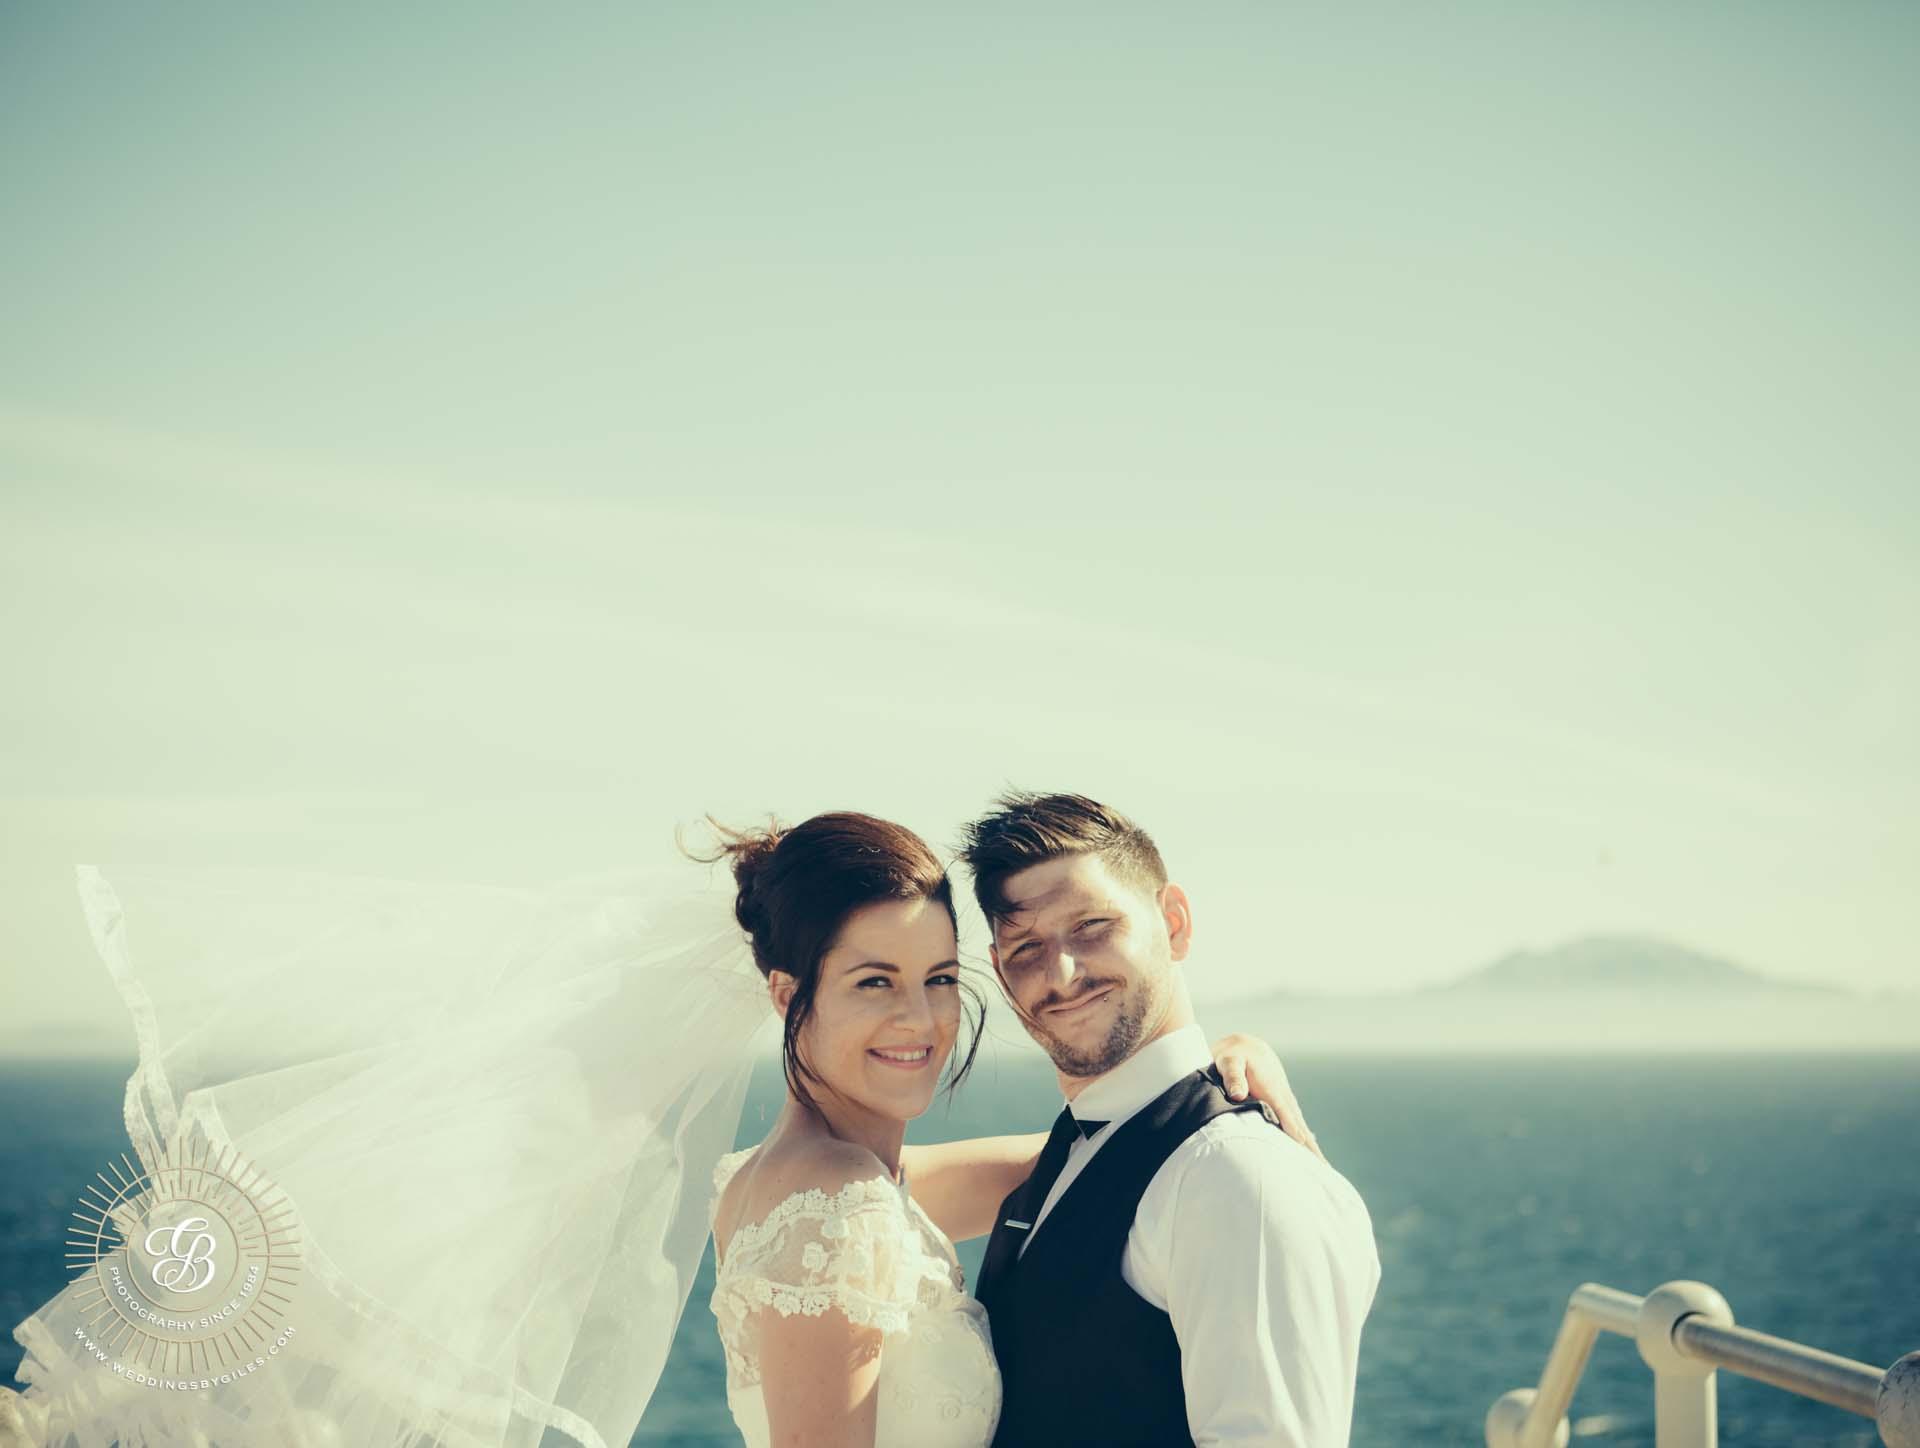 Wedding Photography at Europa point, Gibraltar